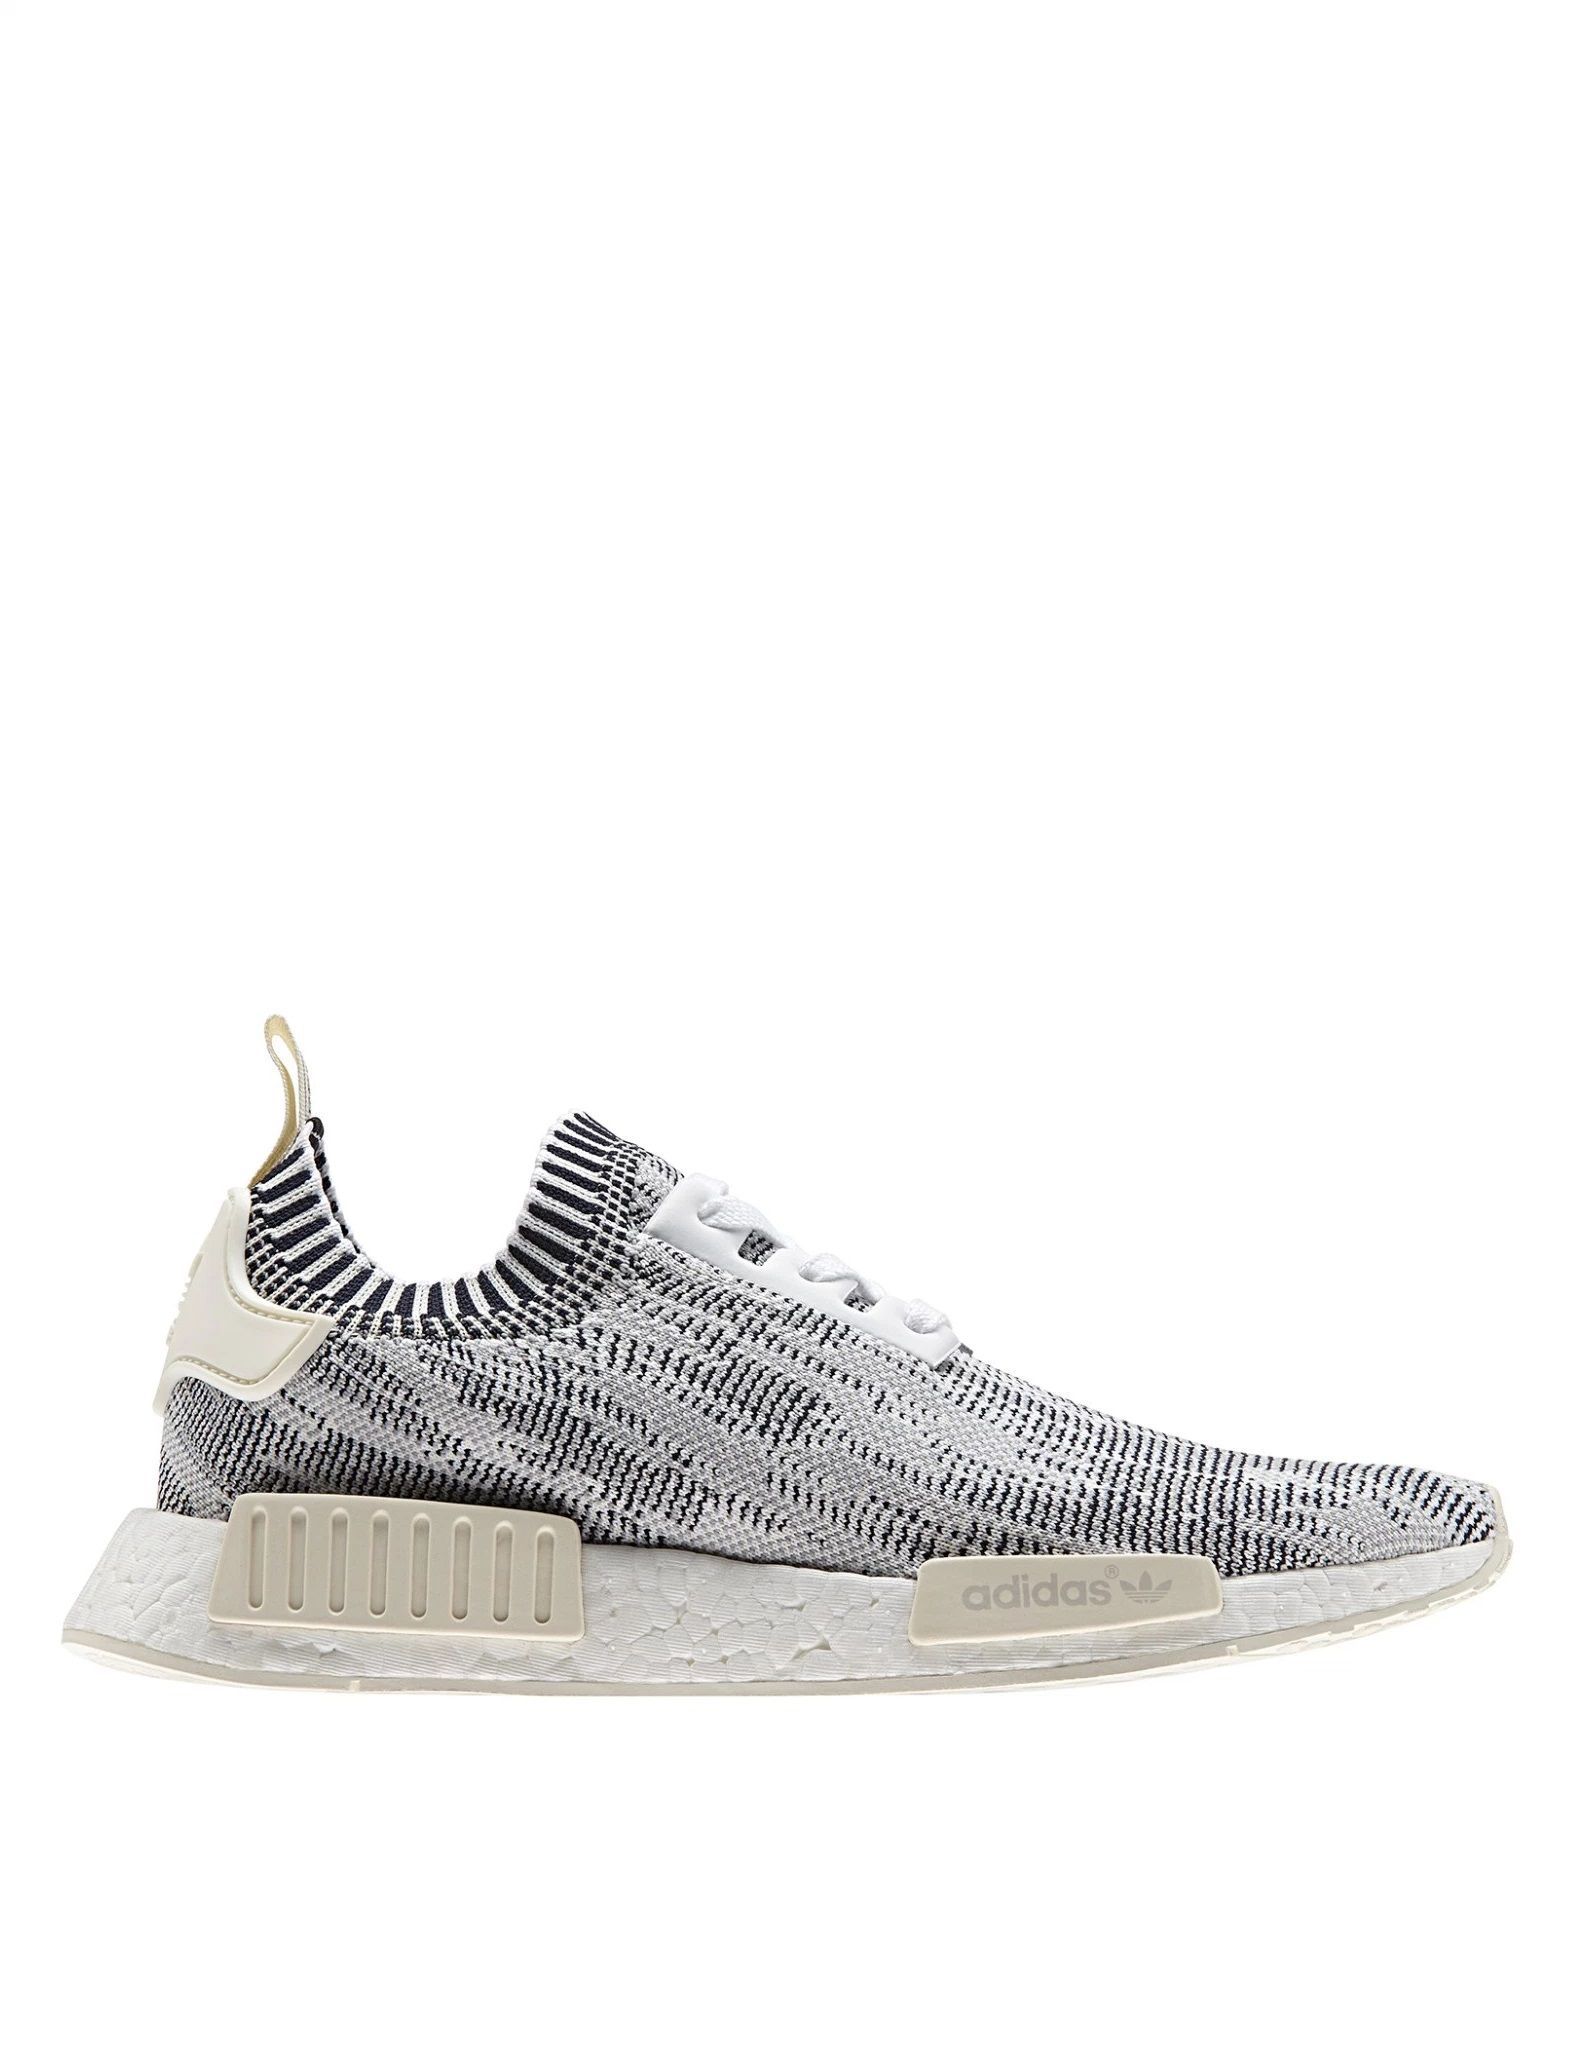 Adidas originali nmd città sock primeknit: grigio chiaro.